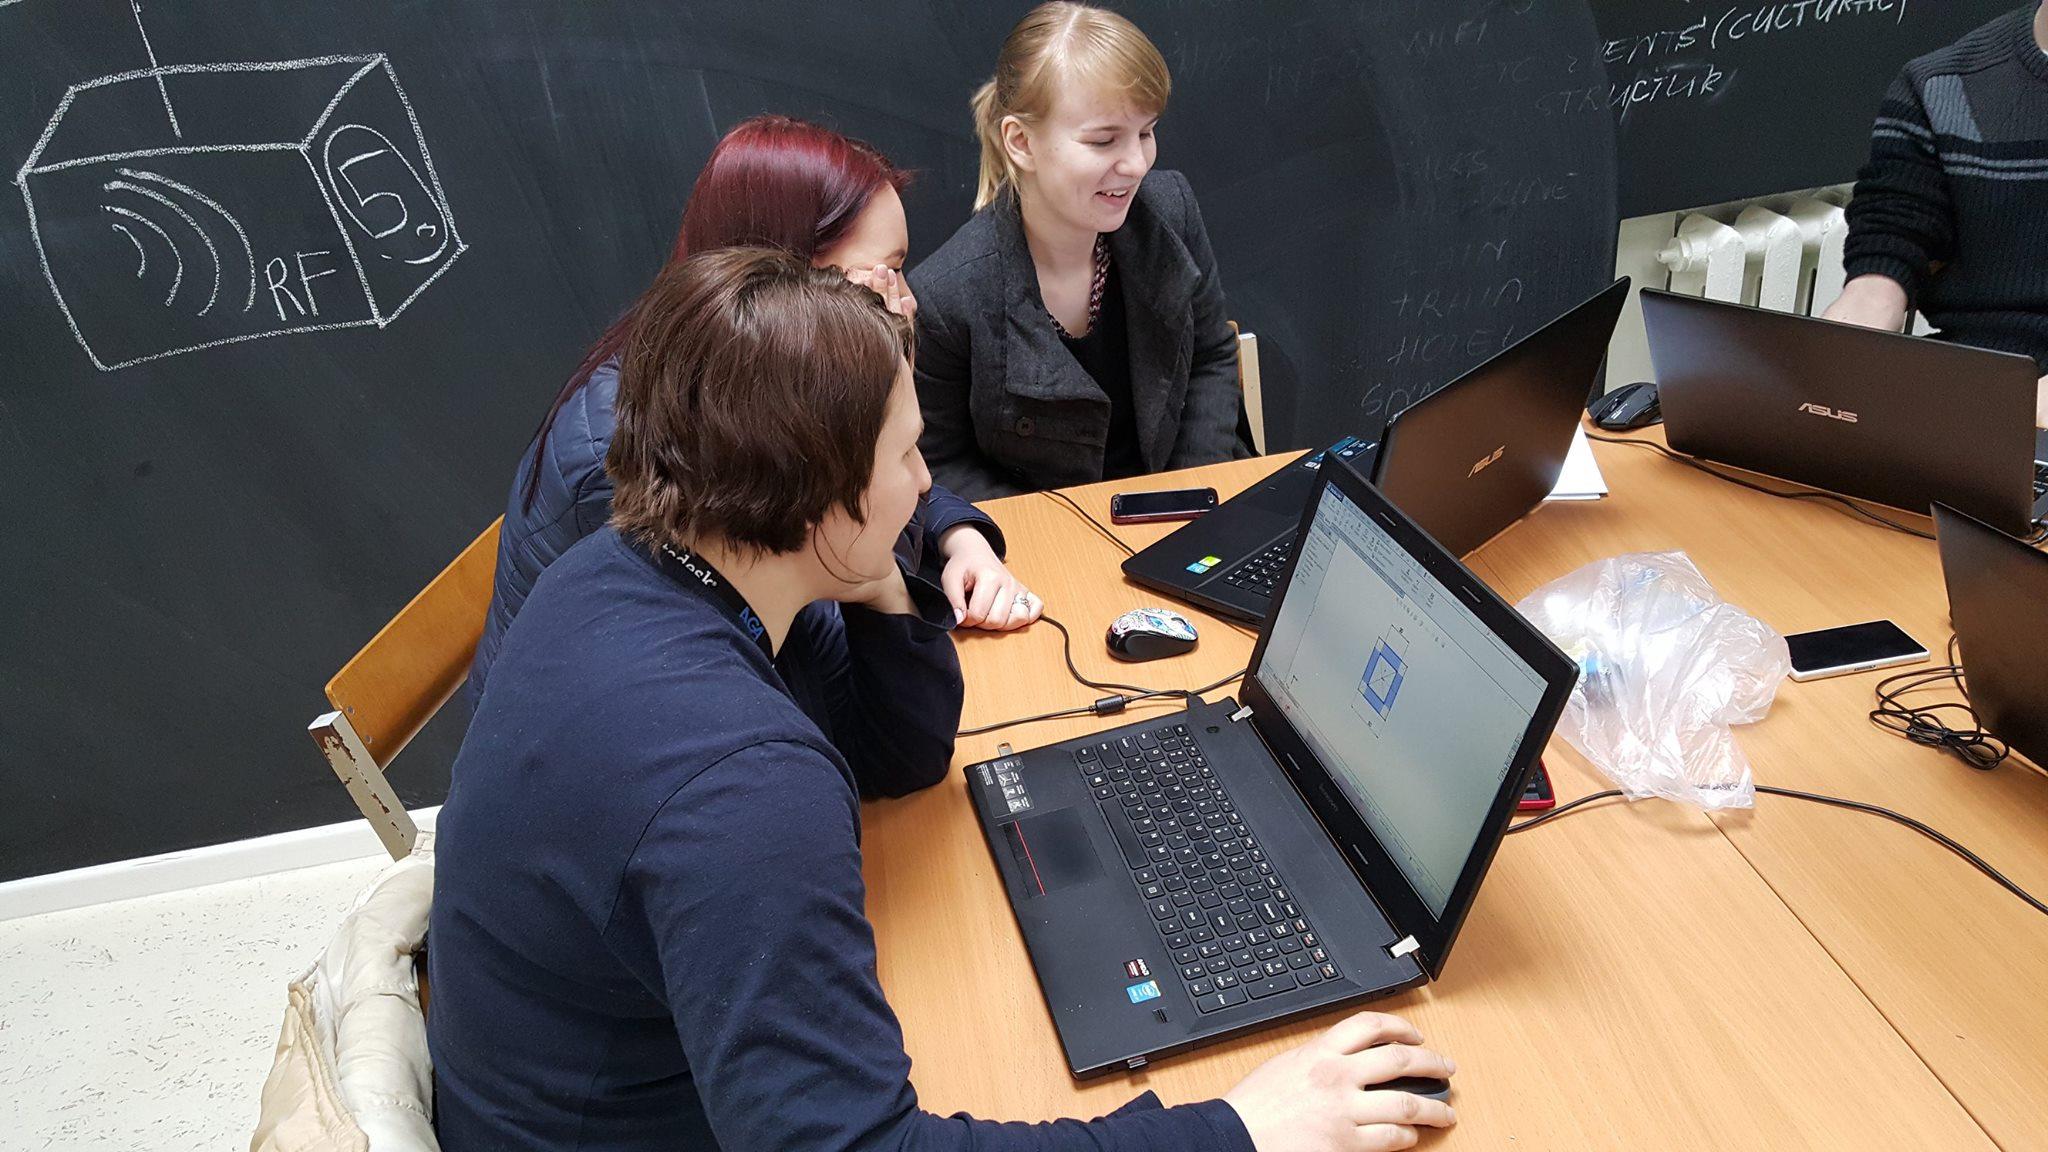 Design thinking kurybinio mastymo metodika KTU 2